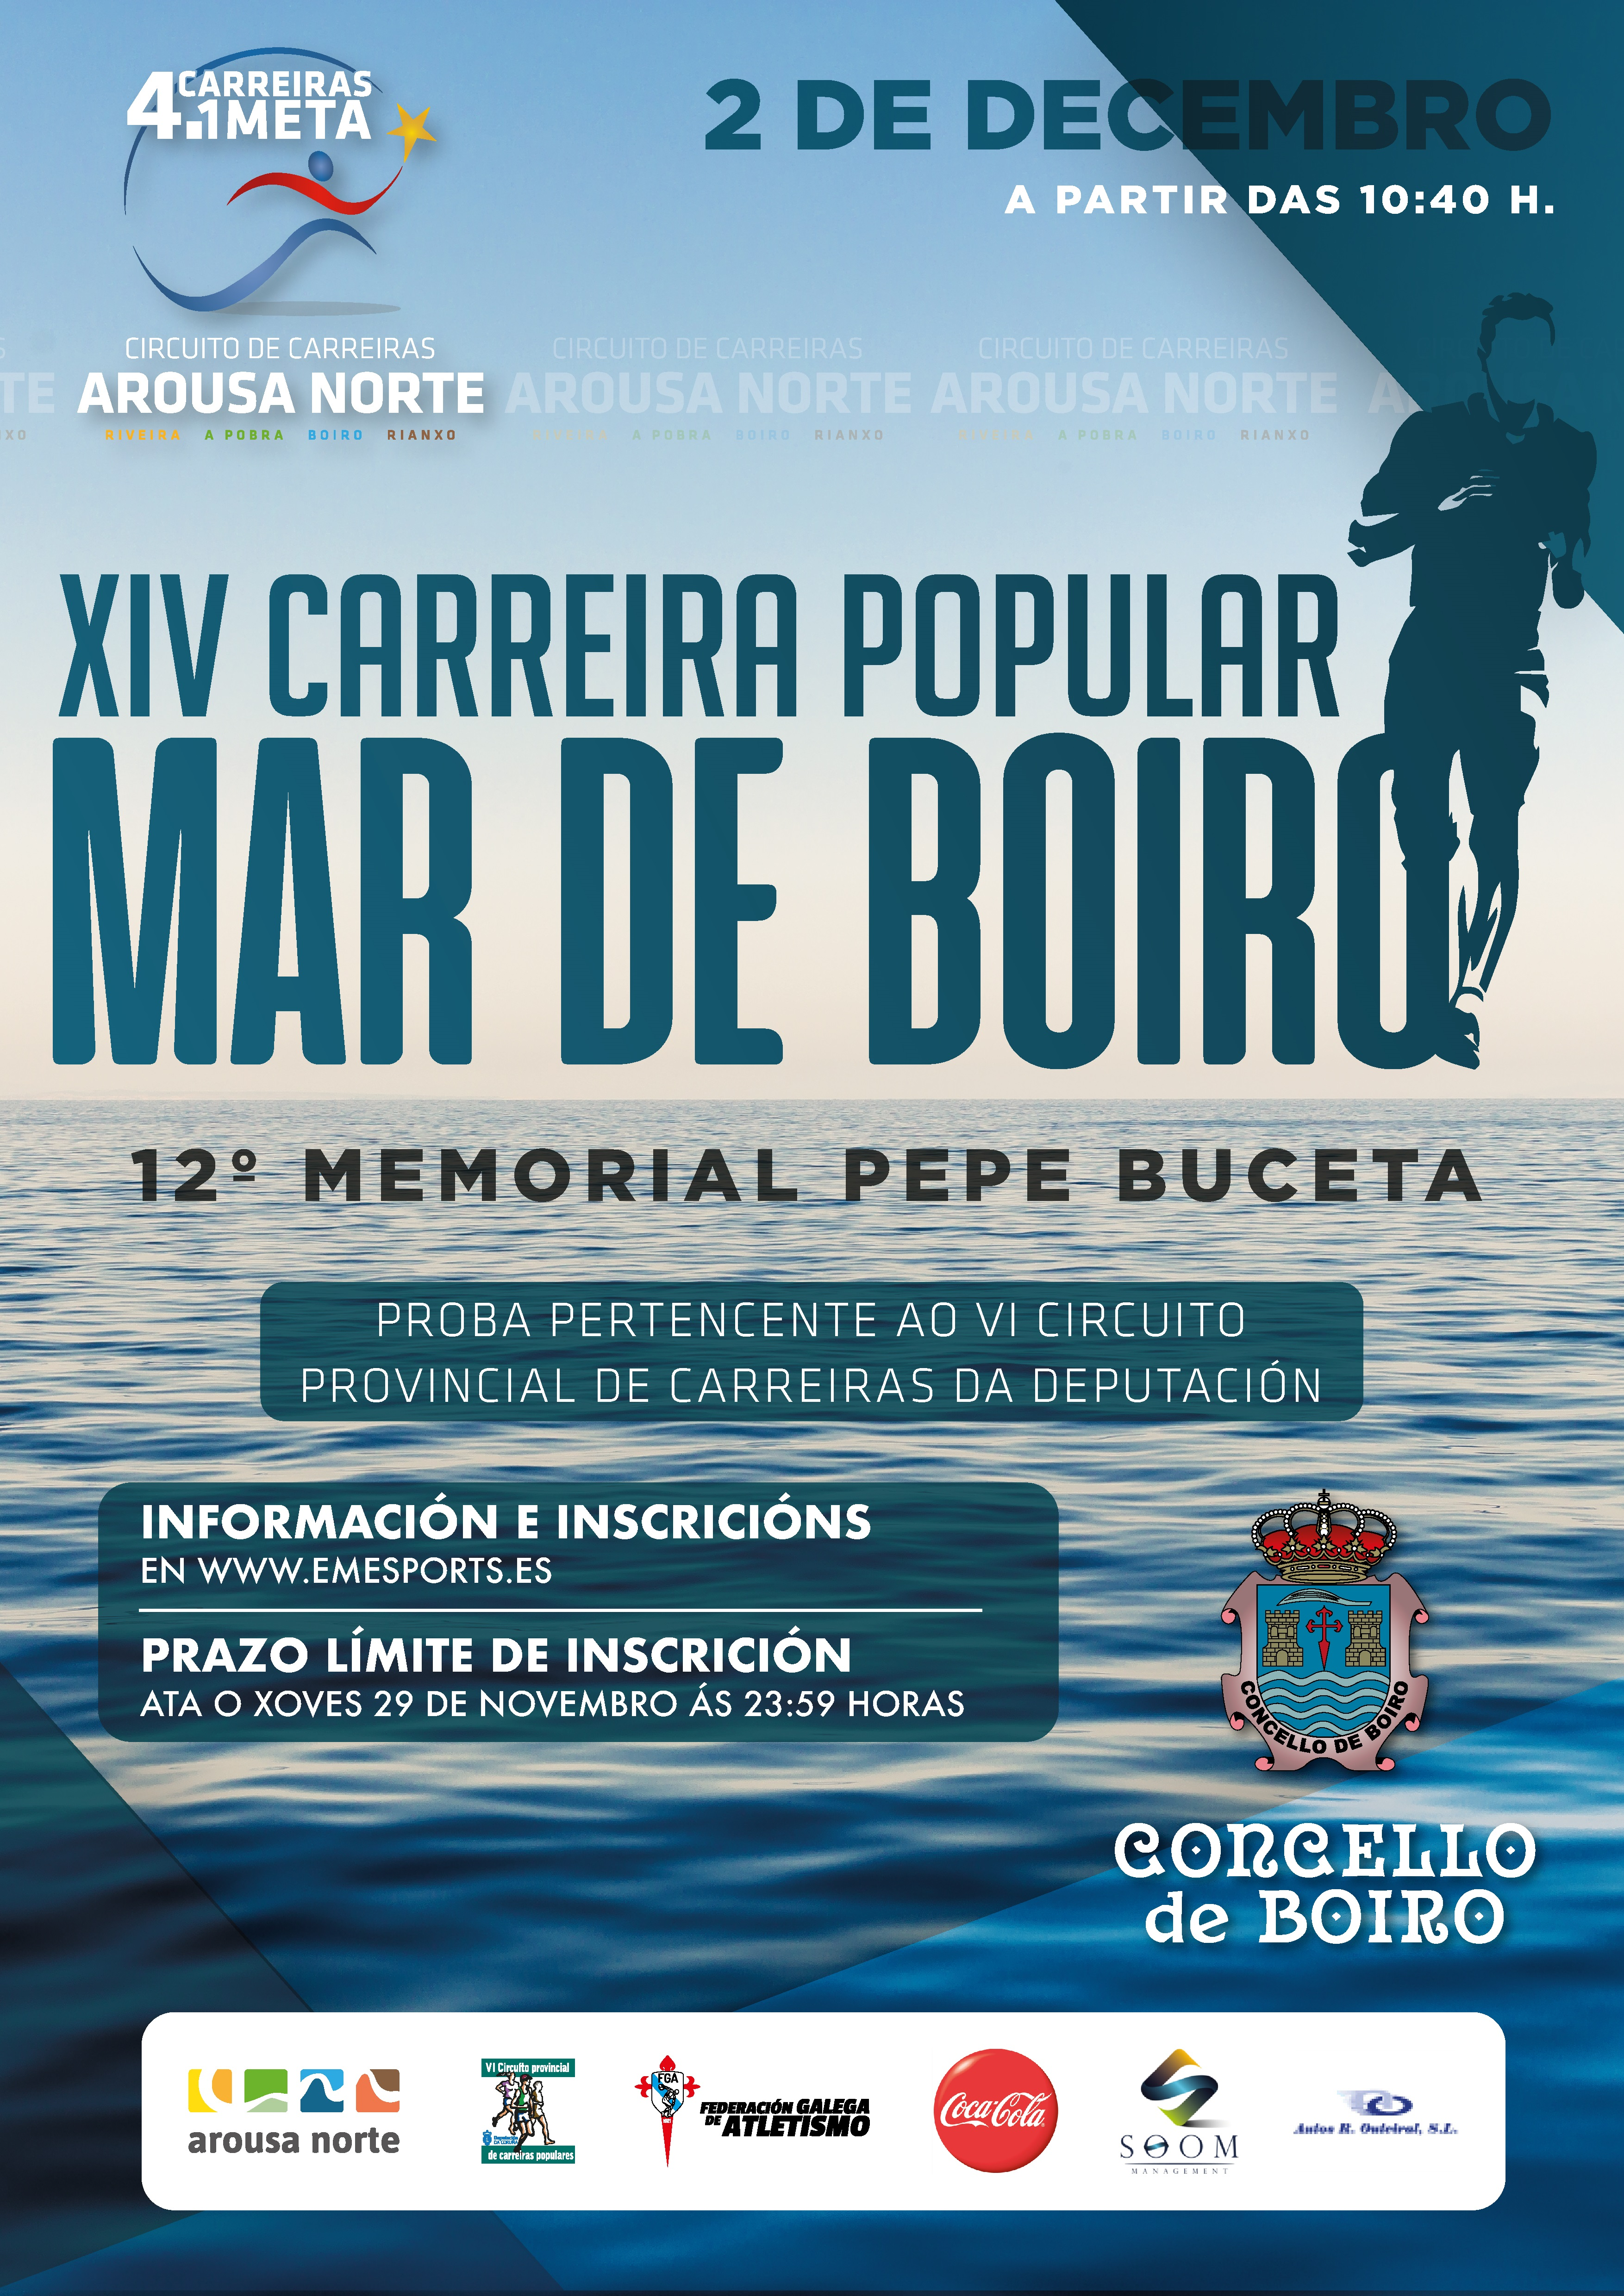 XIV Mar de Boiro – Memorial Pepe Buceta